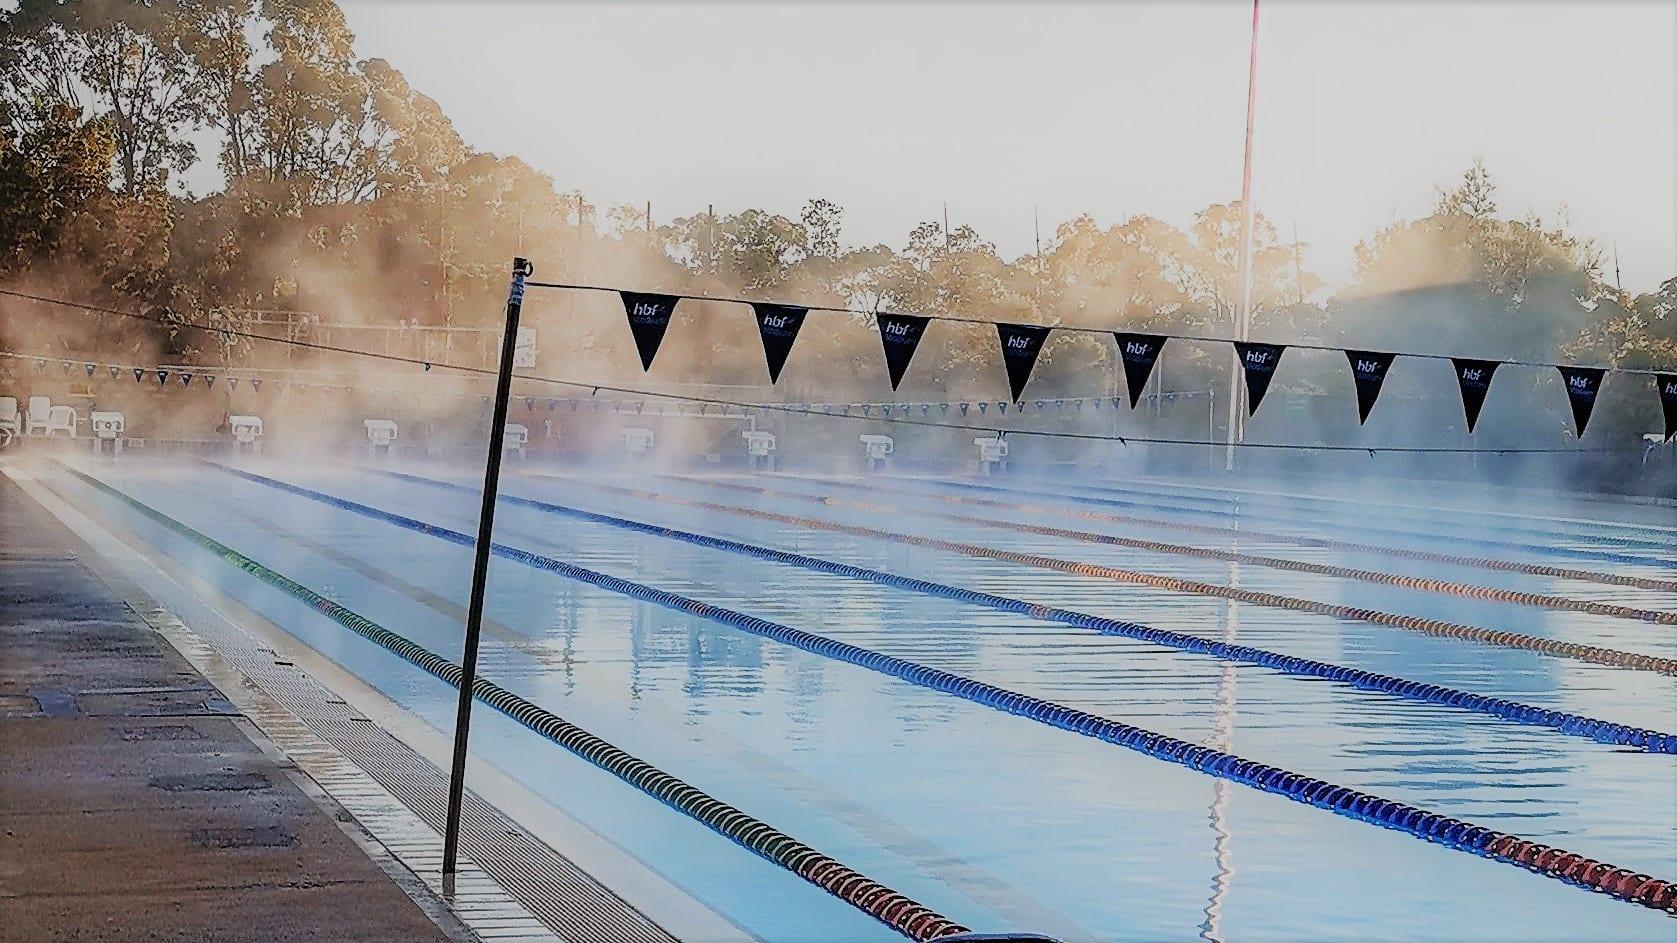 HBF Stadium Outdoor 8-Lane Pool